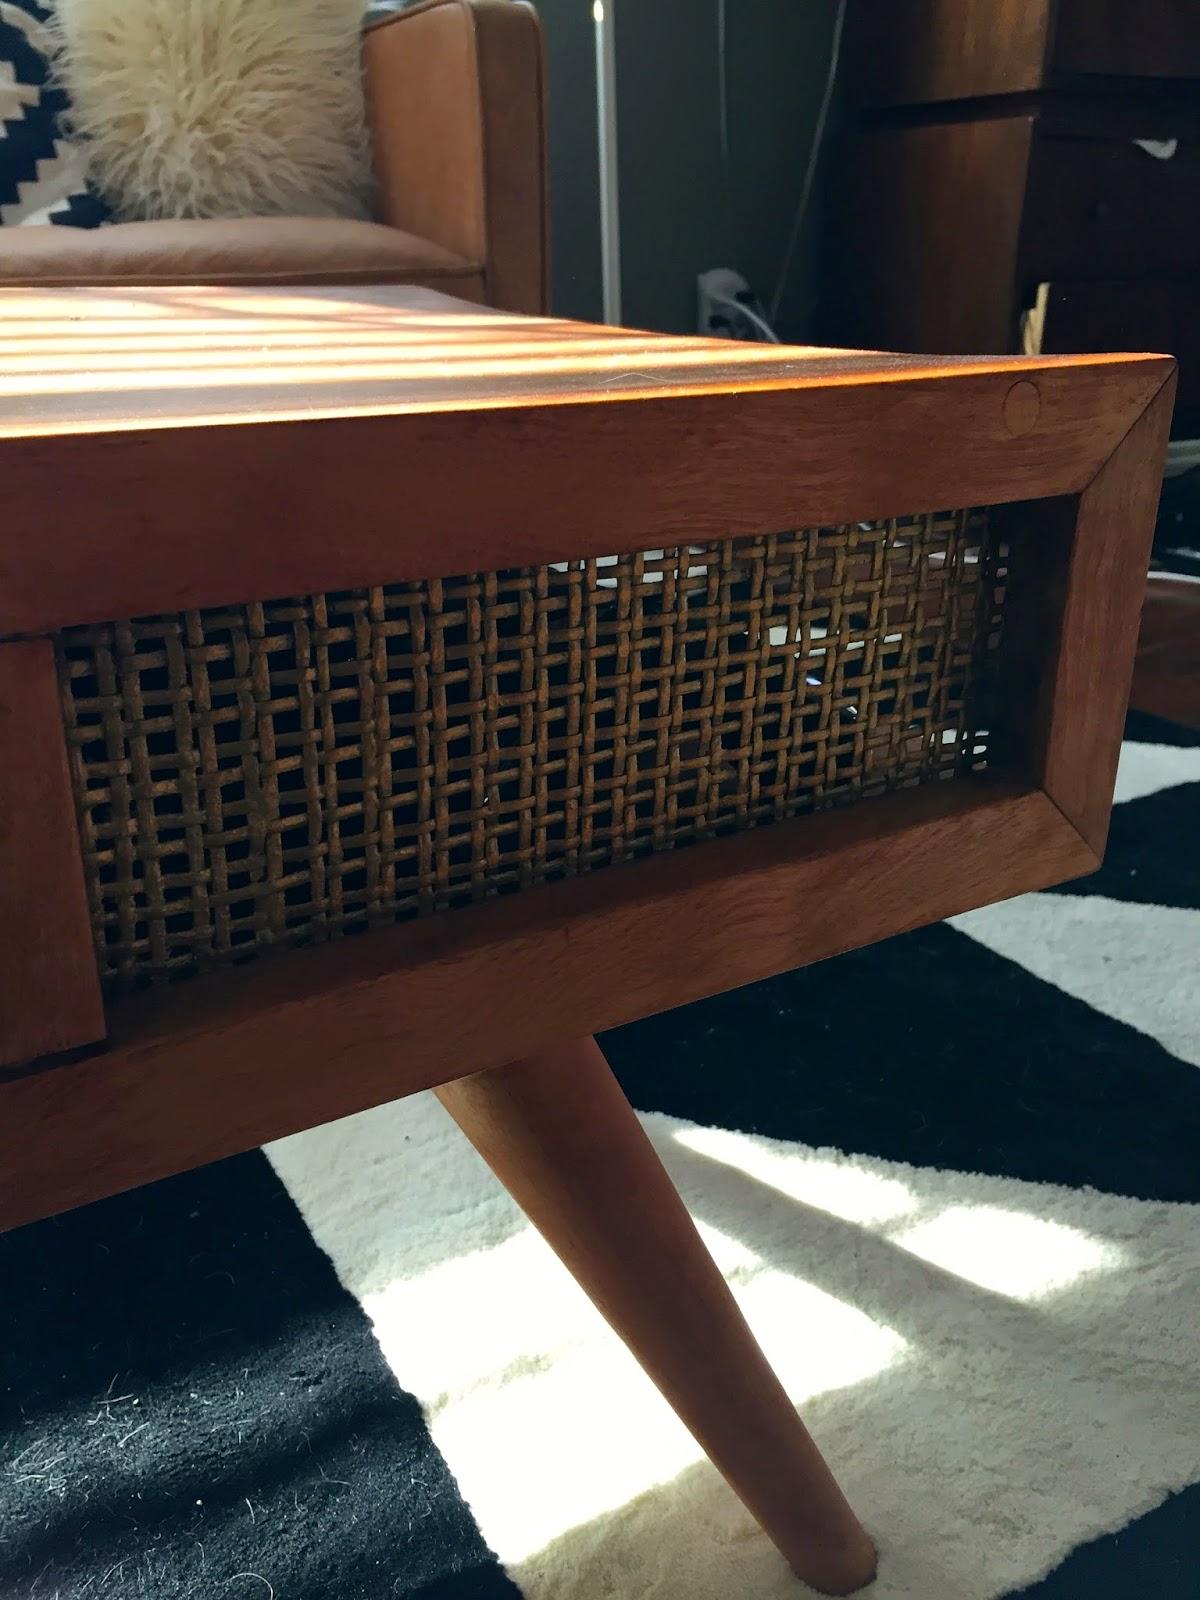 loose shoelaces craigslist coffee table redo. Black Bedroom Furniture Sets. Home Design Ideas